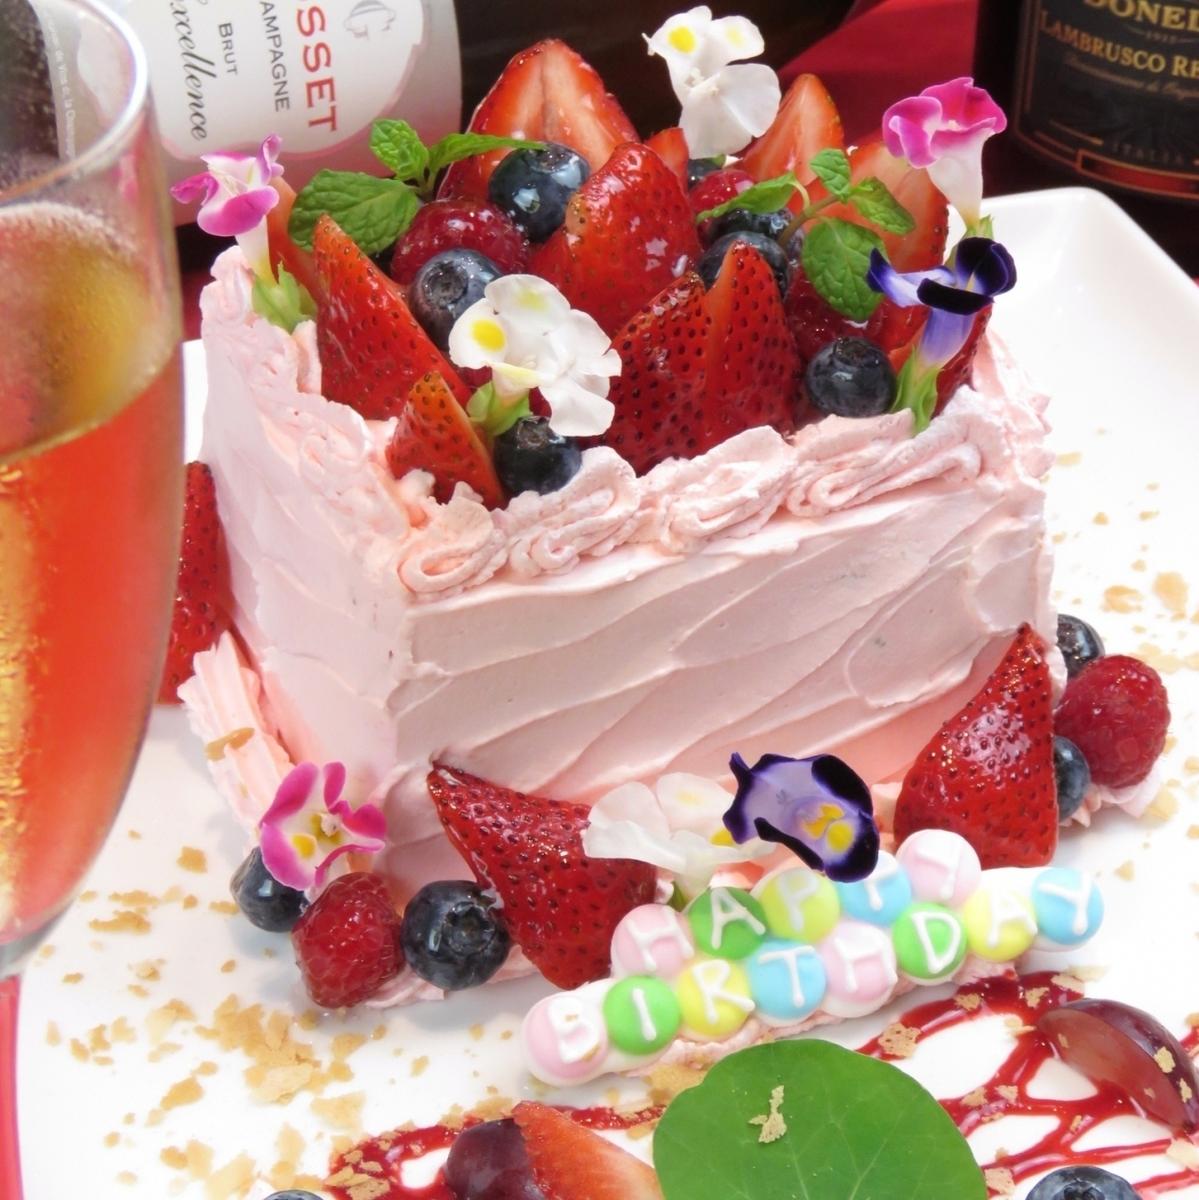 Birthday / anniversary service available